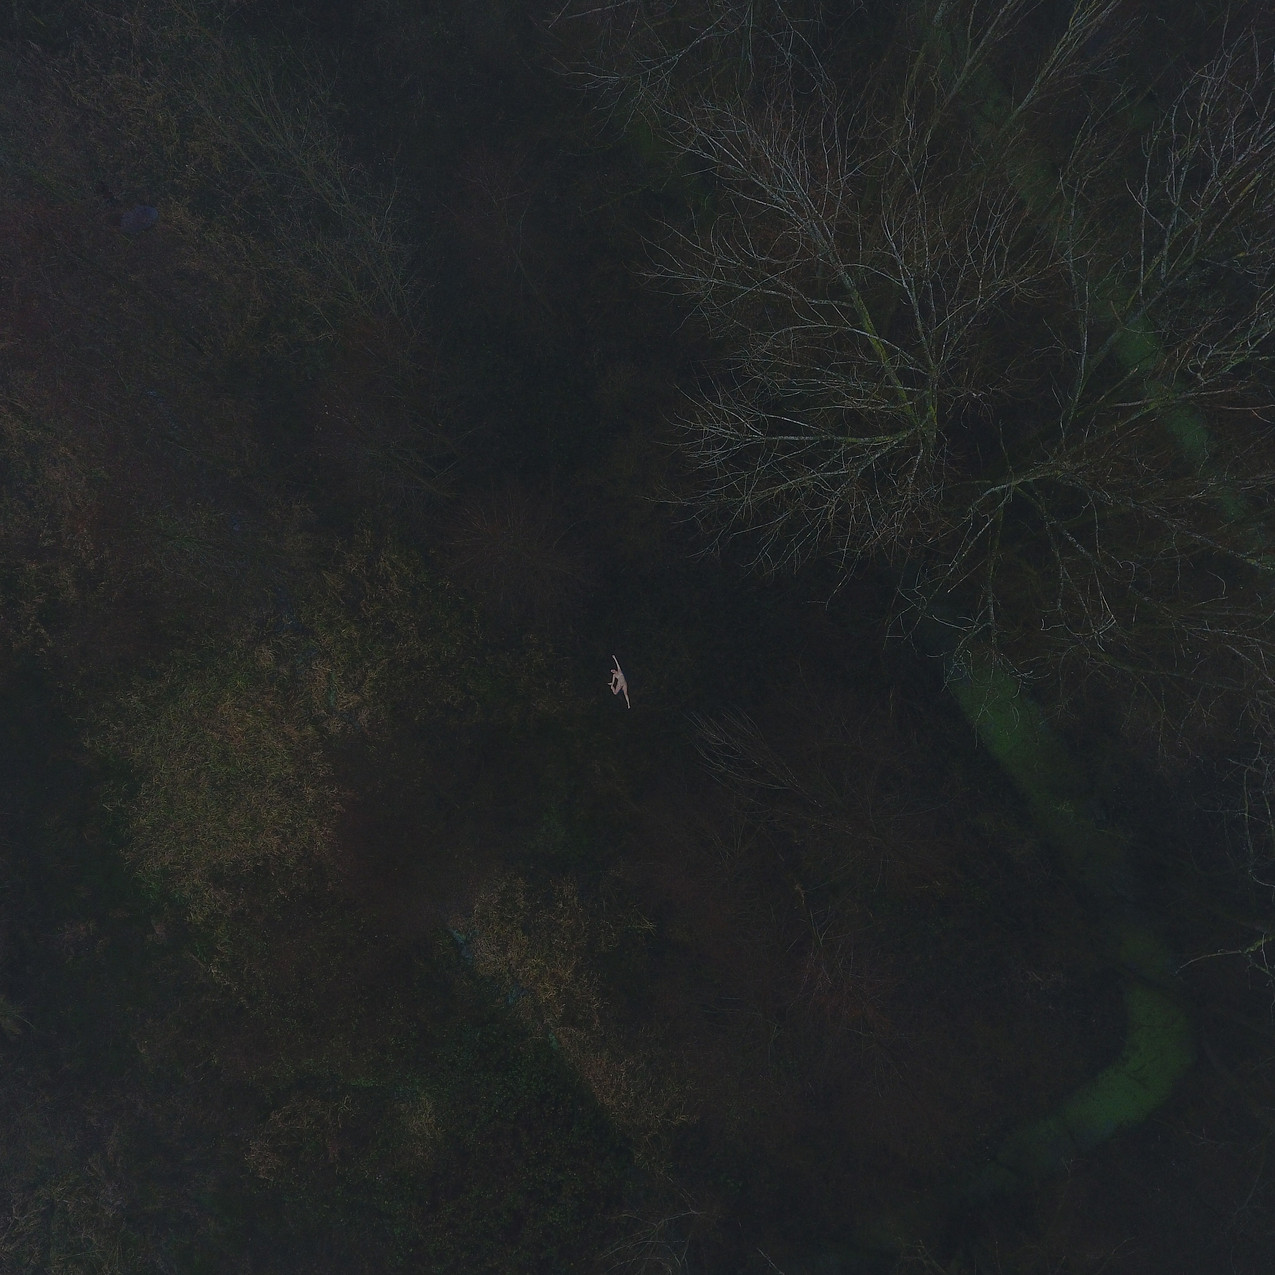 Clara, fog, dark forest